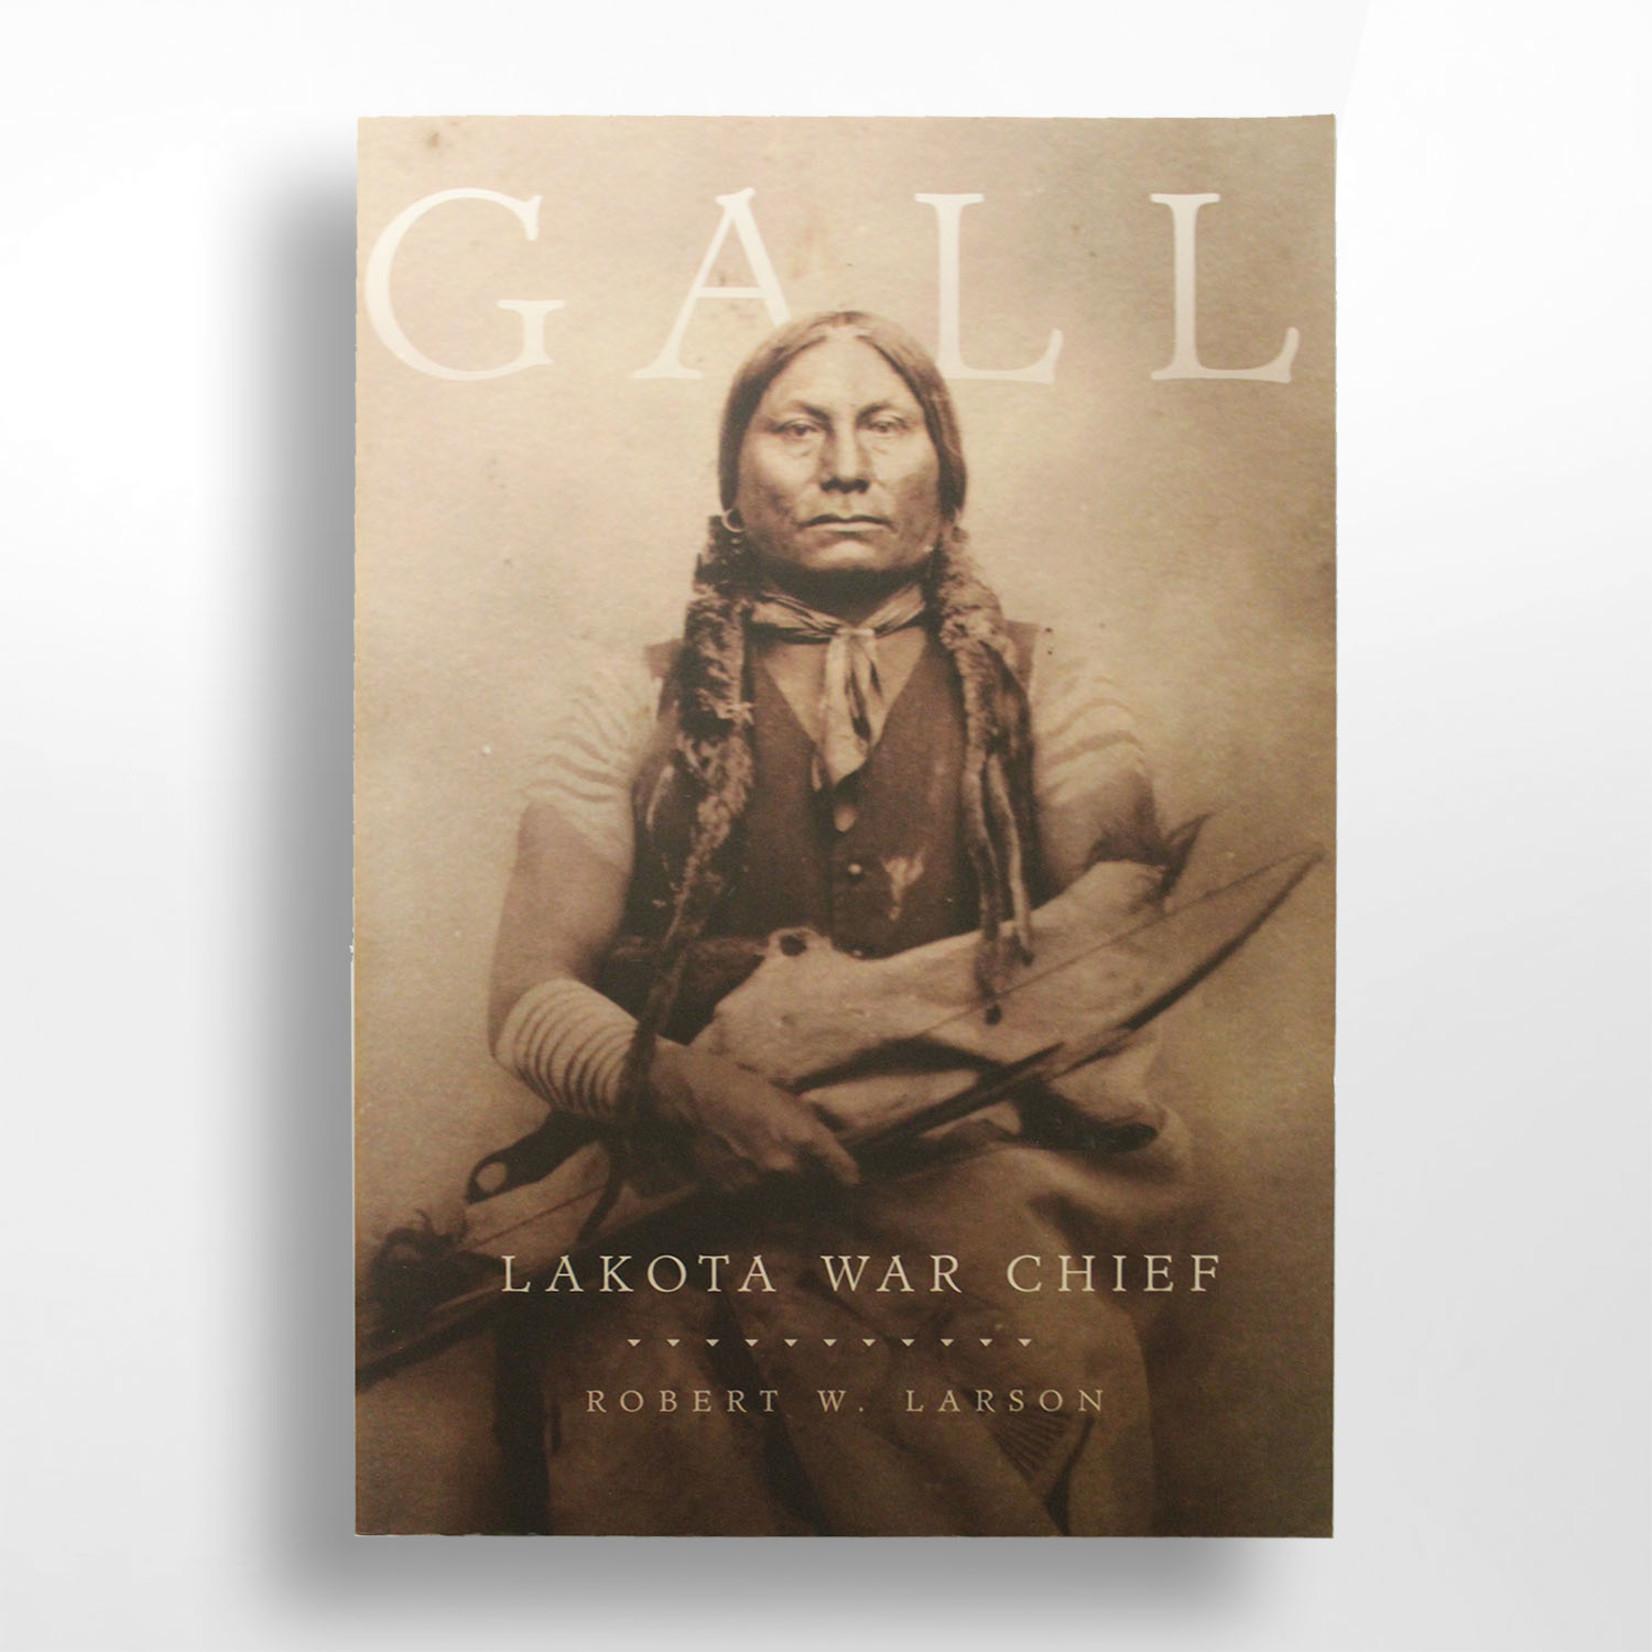 Dakota West Books Gall: A Lakota War Chief